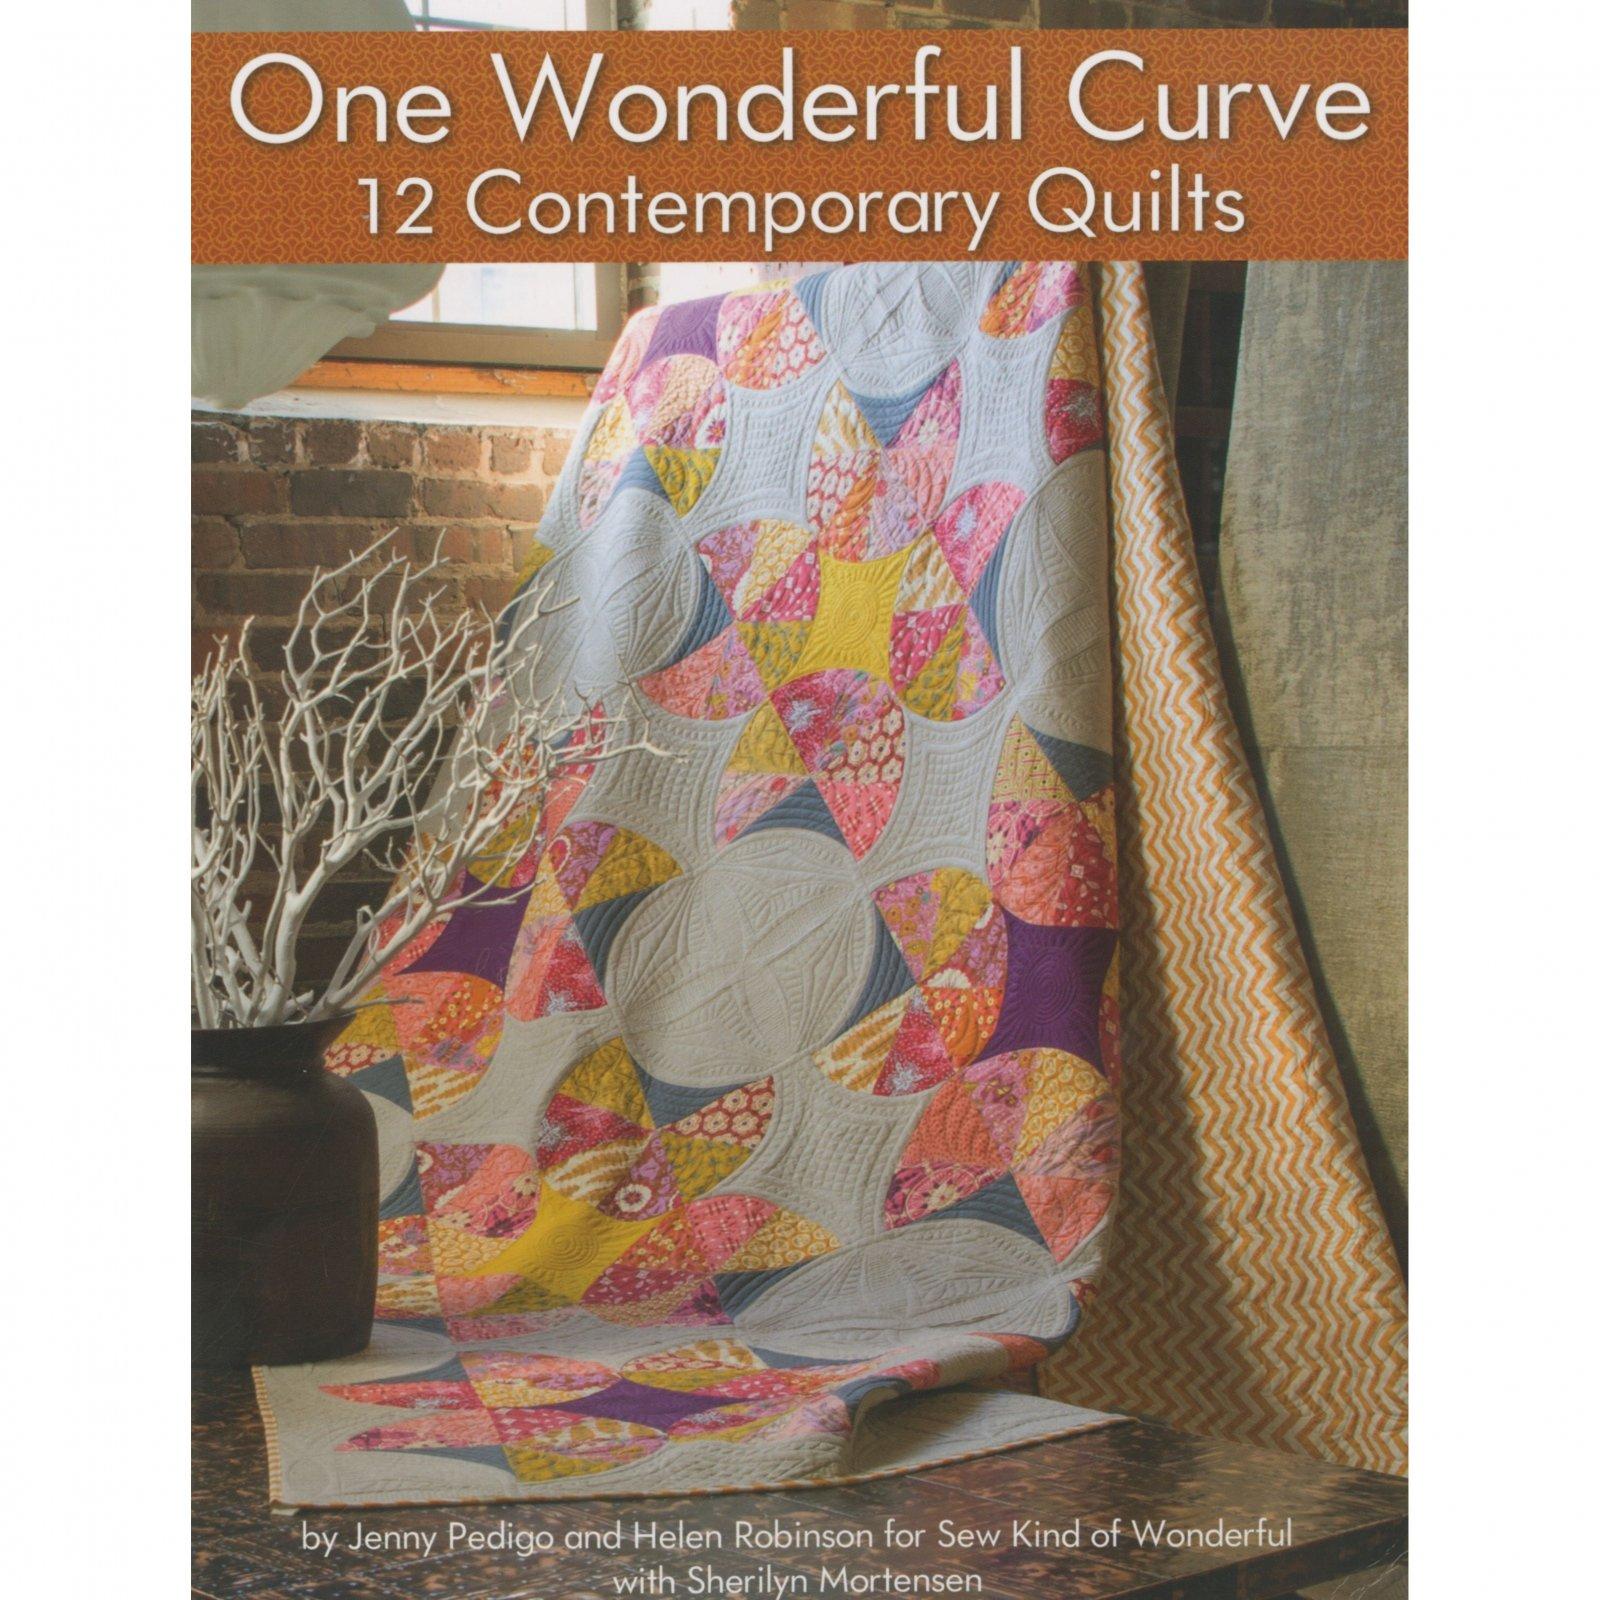 Sew Kind of Wonderful - One Wonderful Curve Book